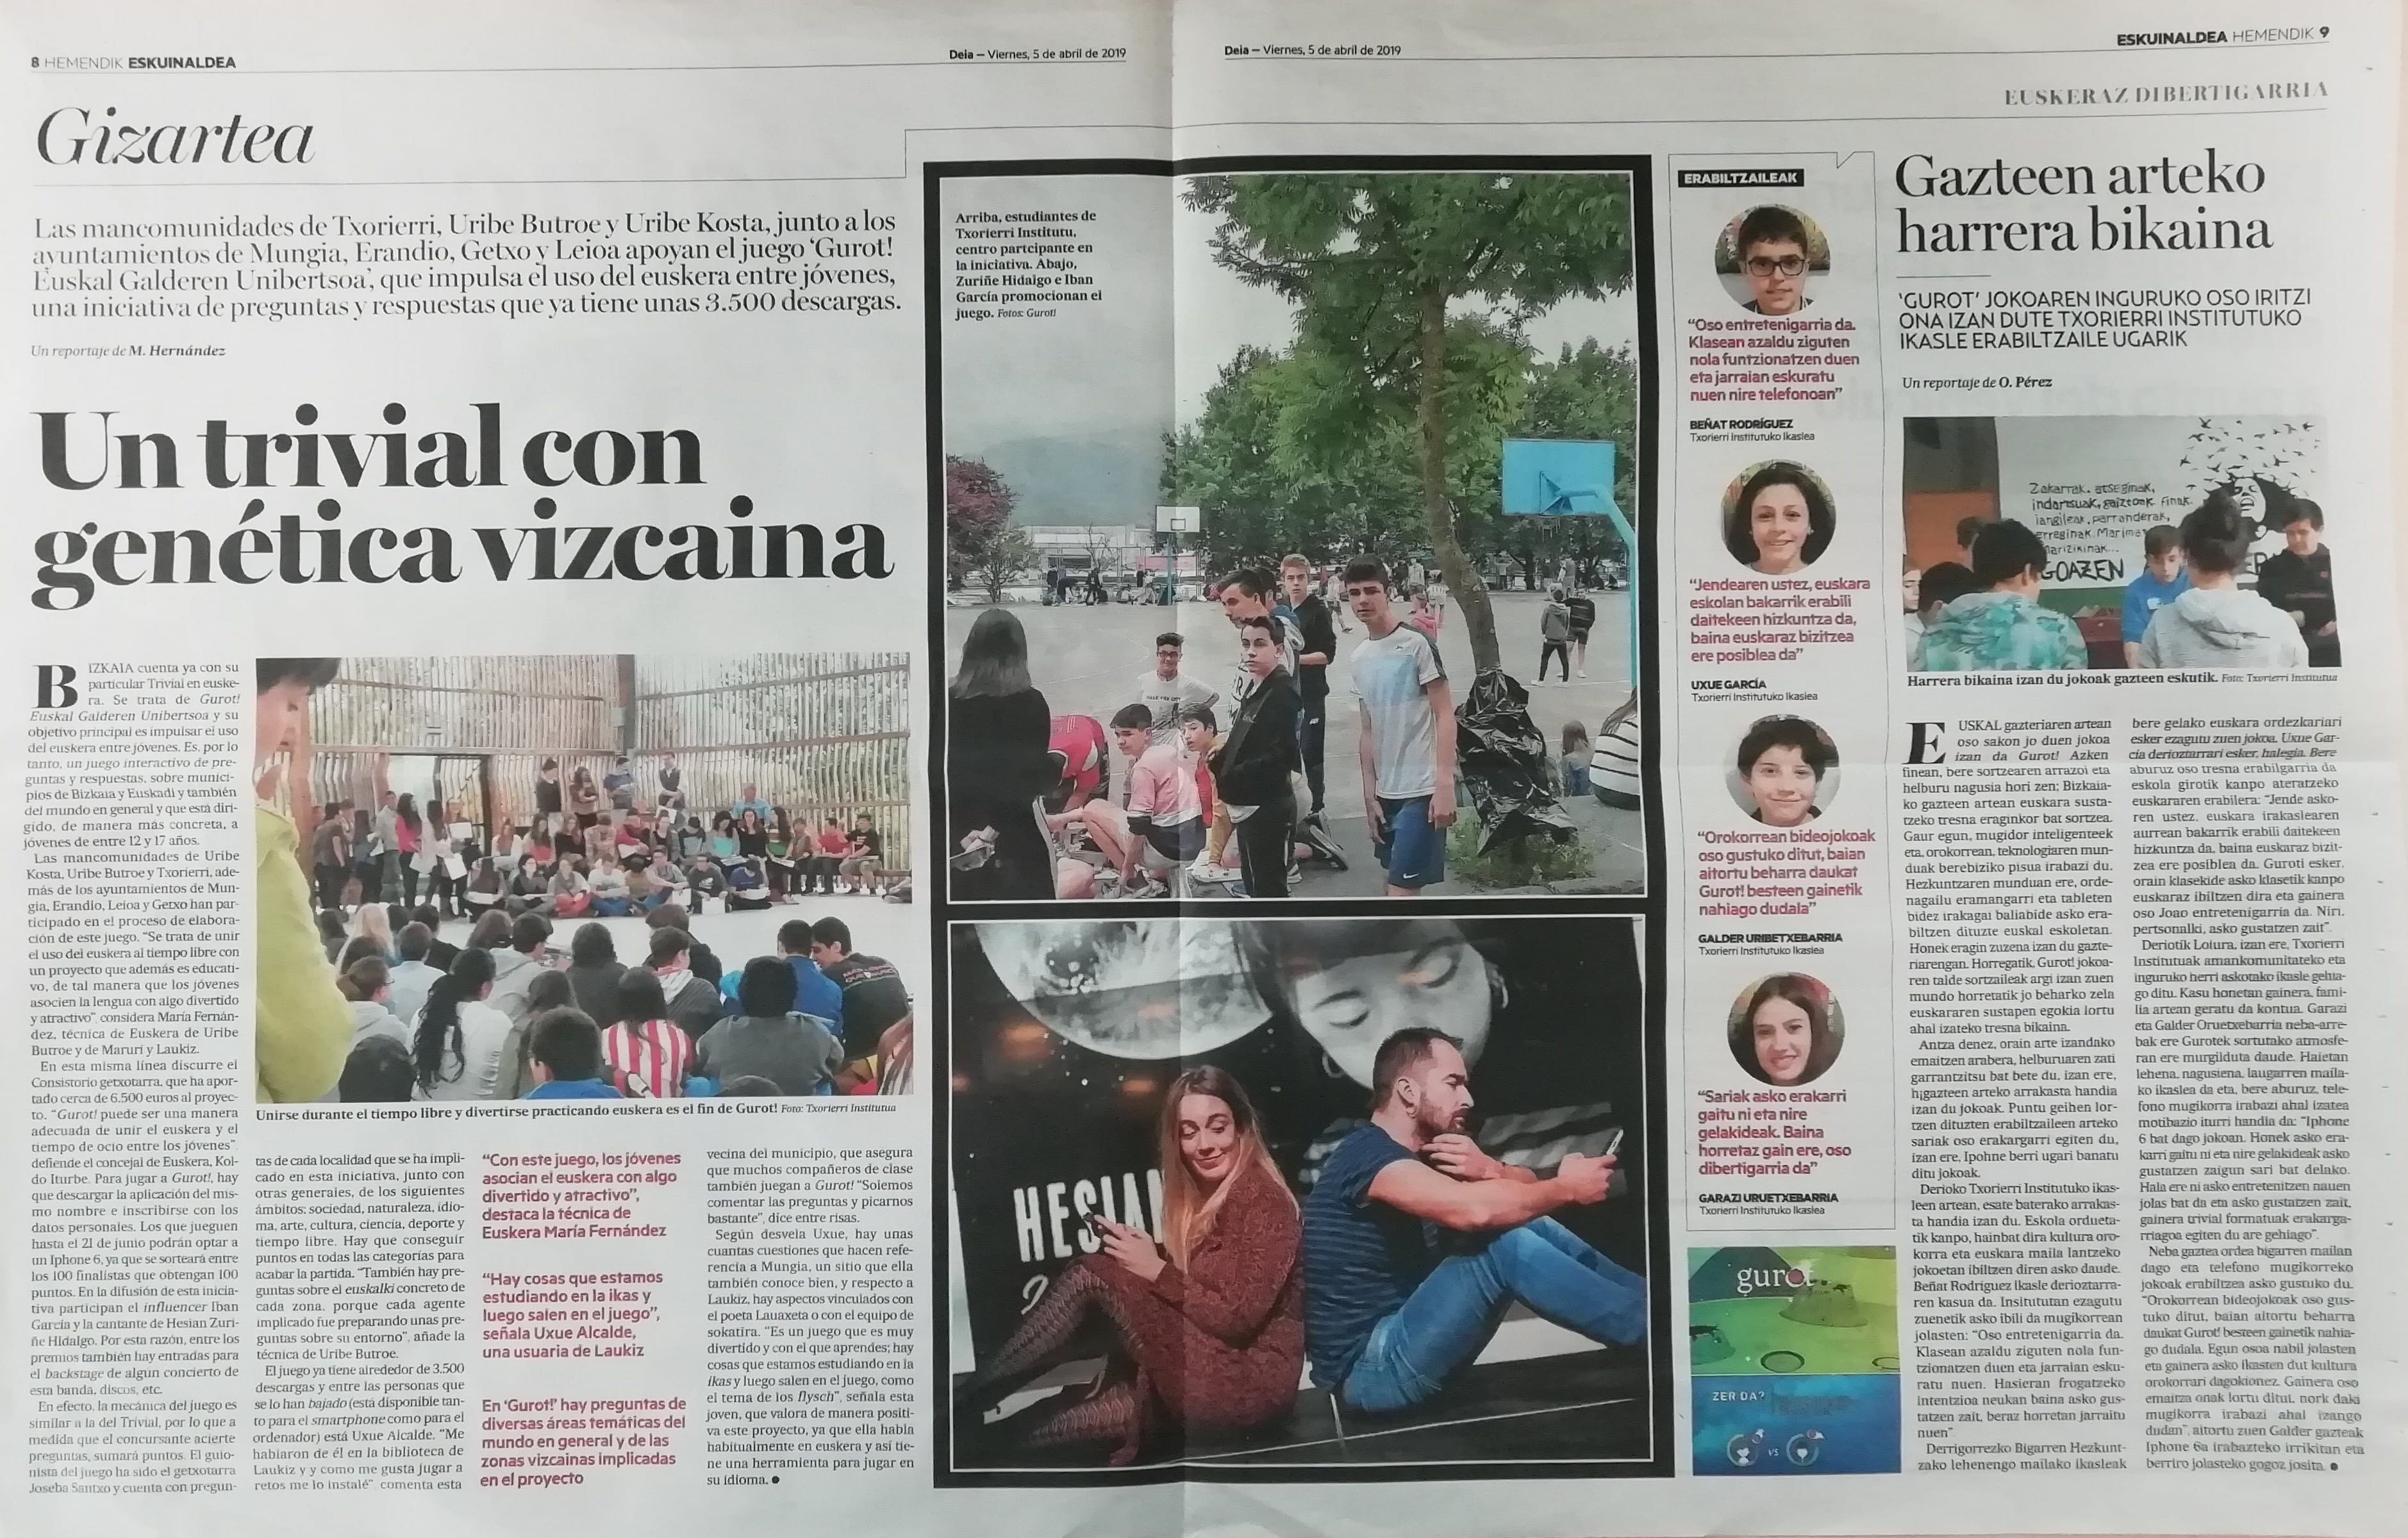 Fotografría del reportaje que el diario vasco Deia publicó sobre Gurot!, el trivial de Gestionet que fomenta el uso del euskera.